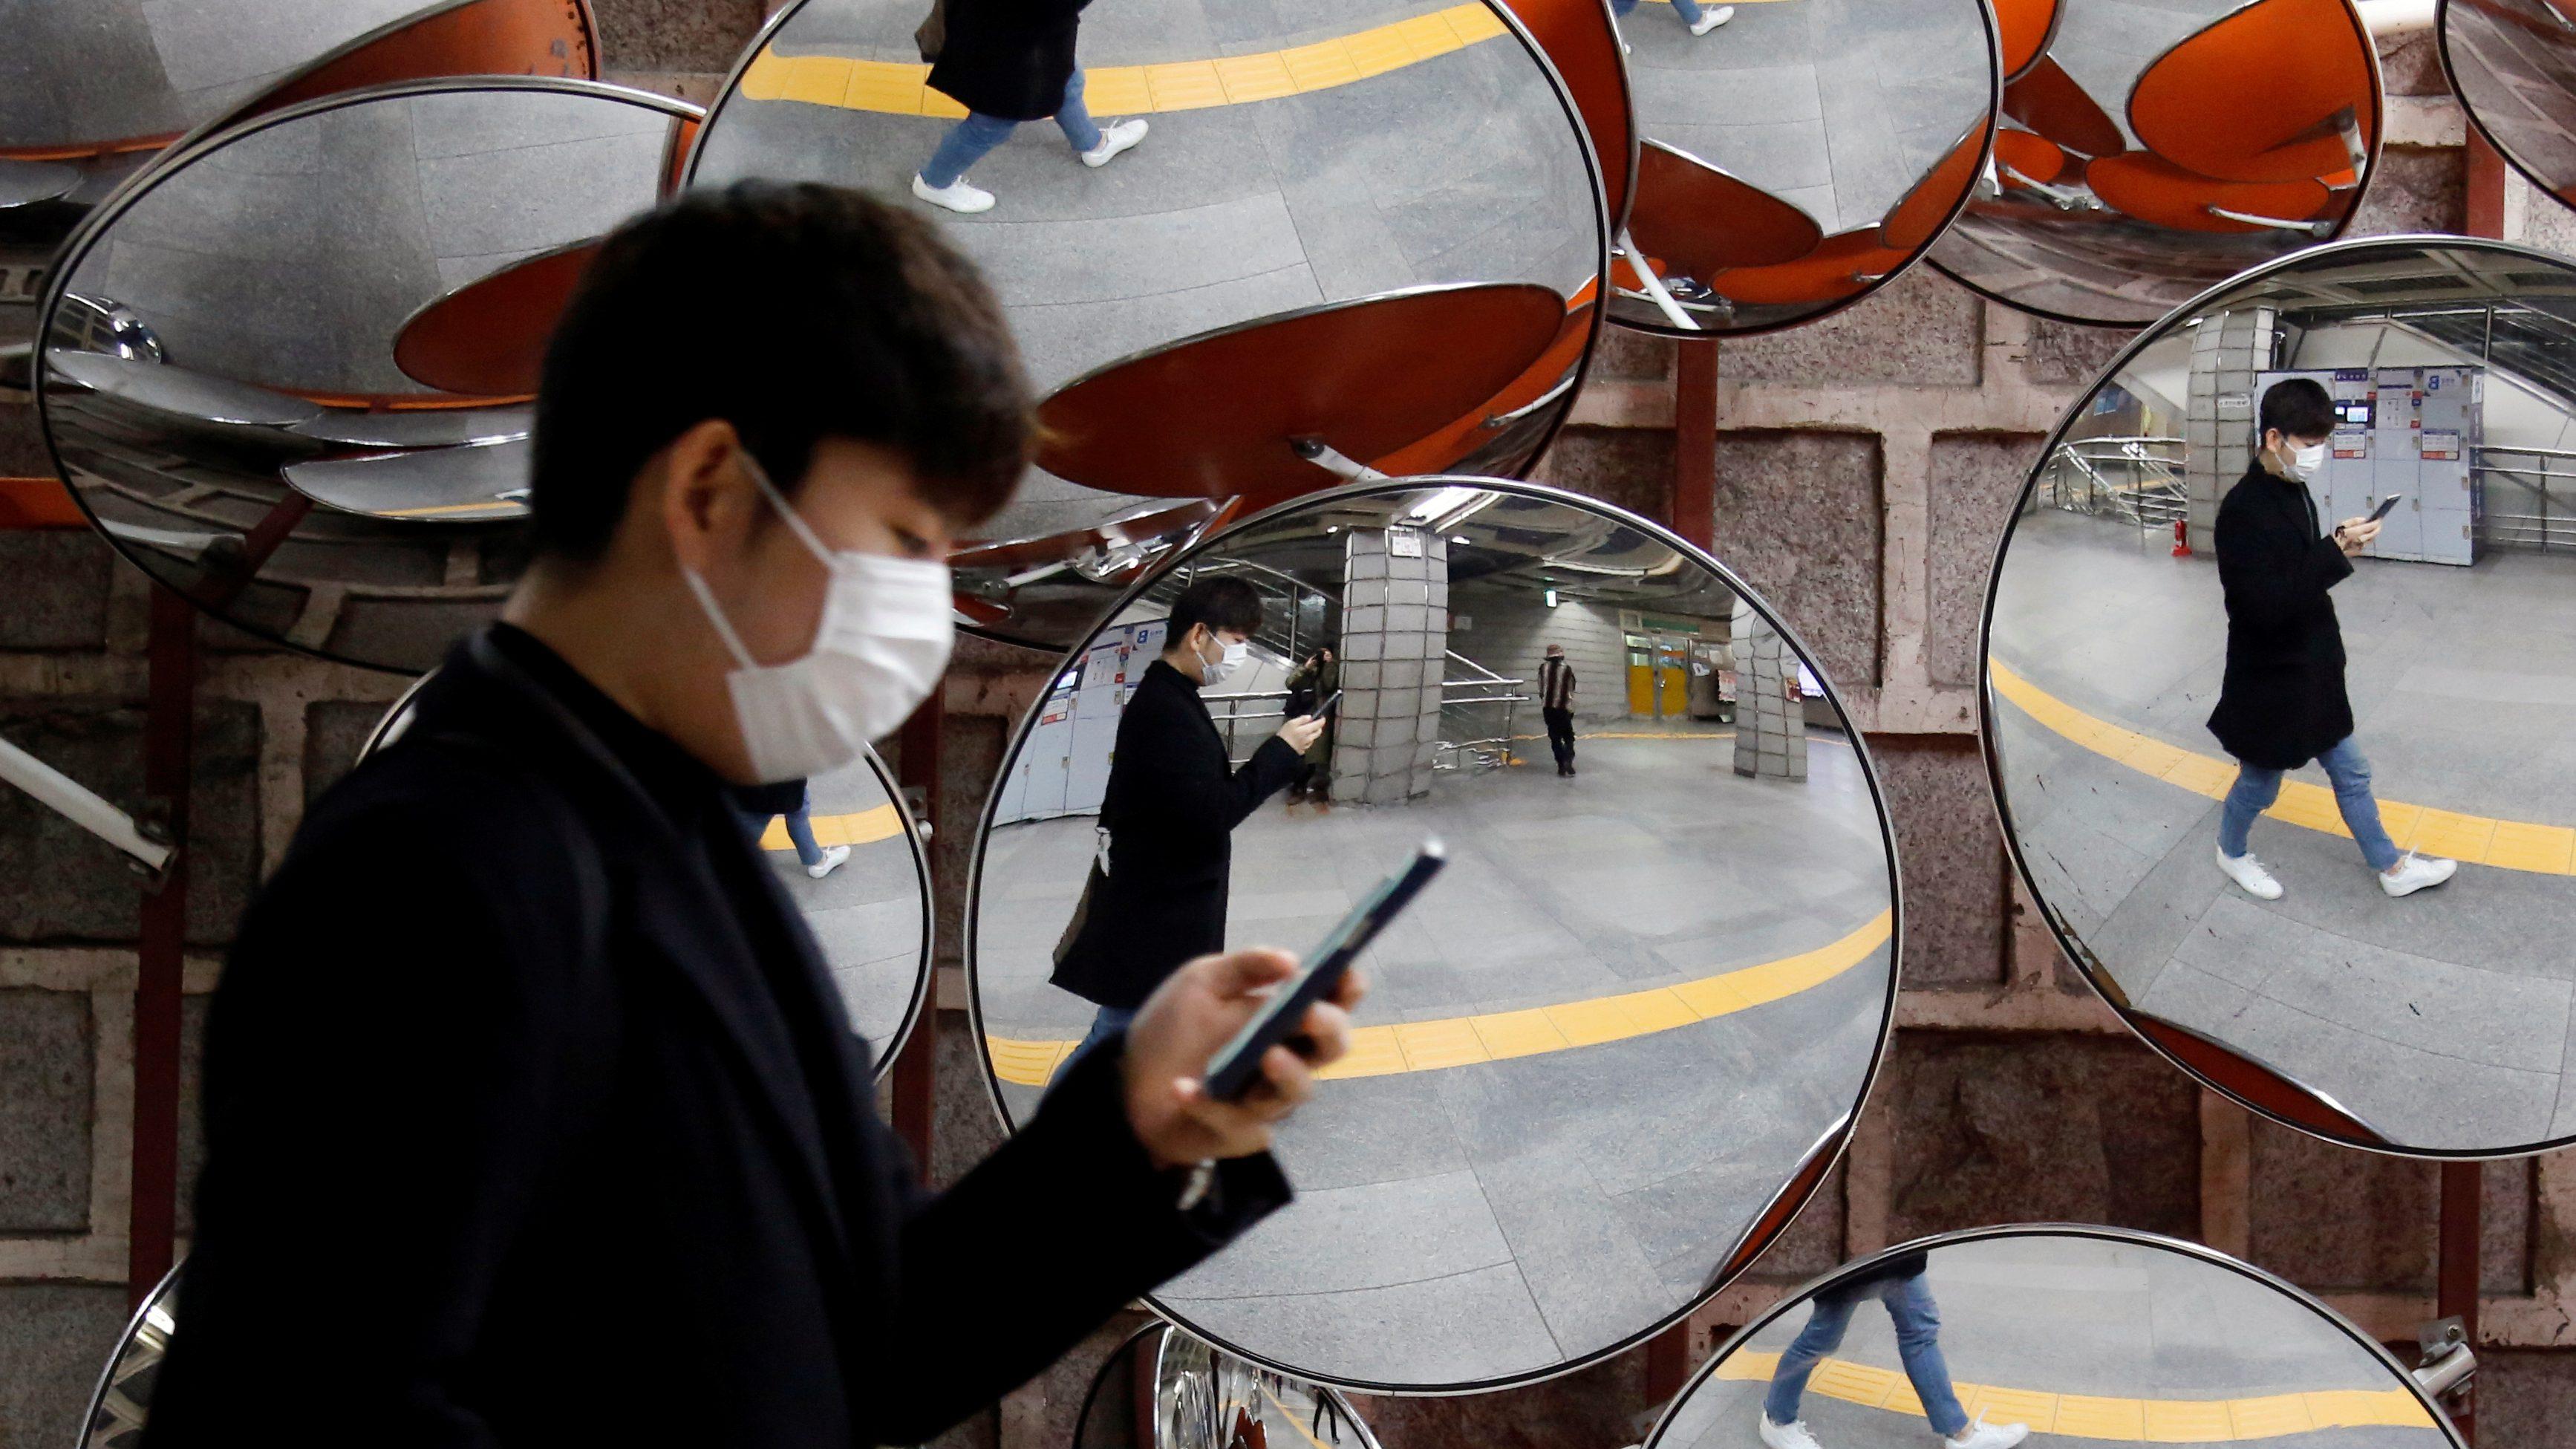 South Koreans are using smartphone apps to avoid coronavirus — Quartz